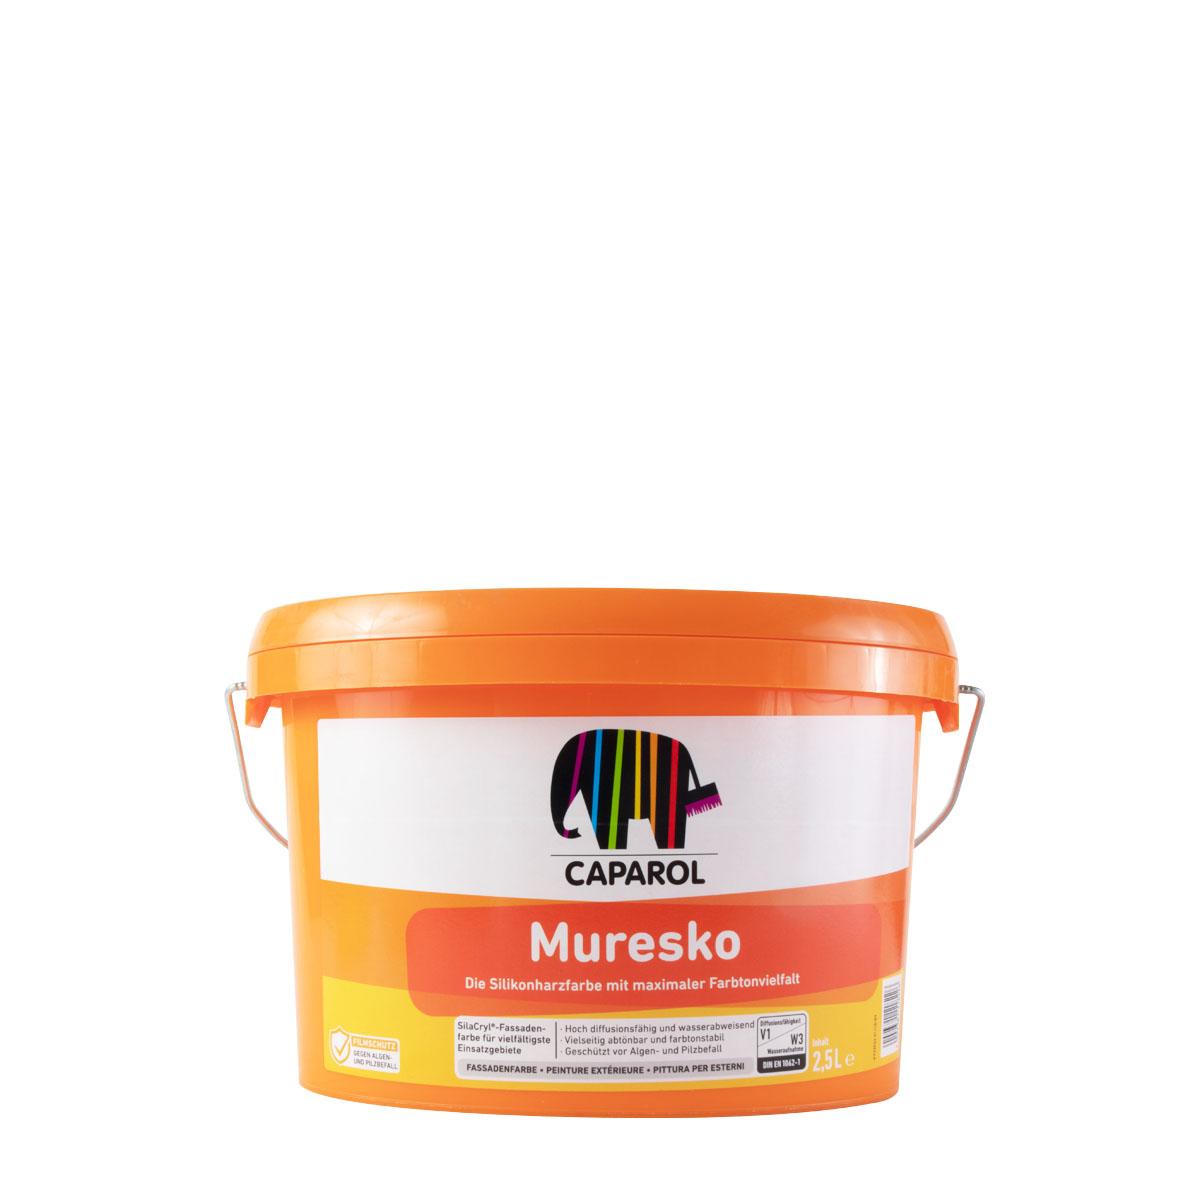 Caparol Muresko SilaCryl 2,5L MIX ,Siliconharz-Fassadenfarbe